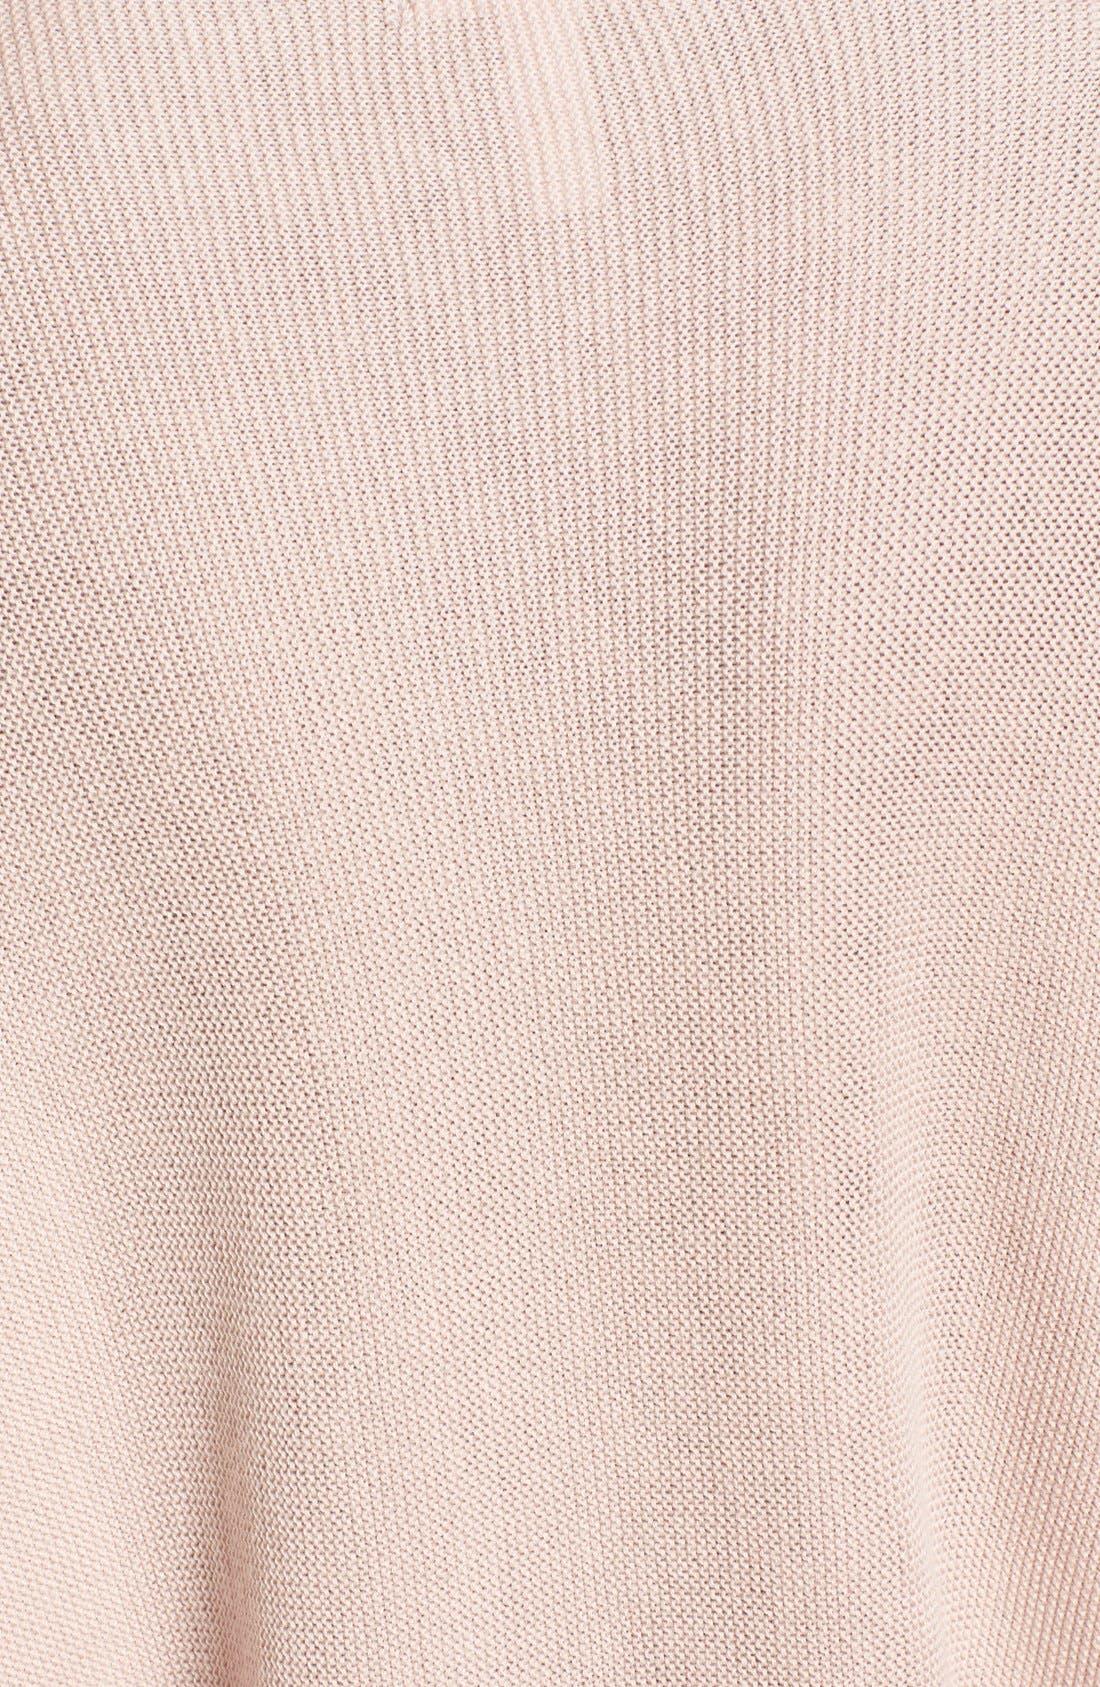 Ruffle Sleeve Sweater,                             Alternate thumbnail 18, color,